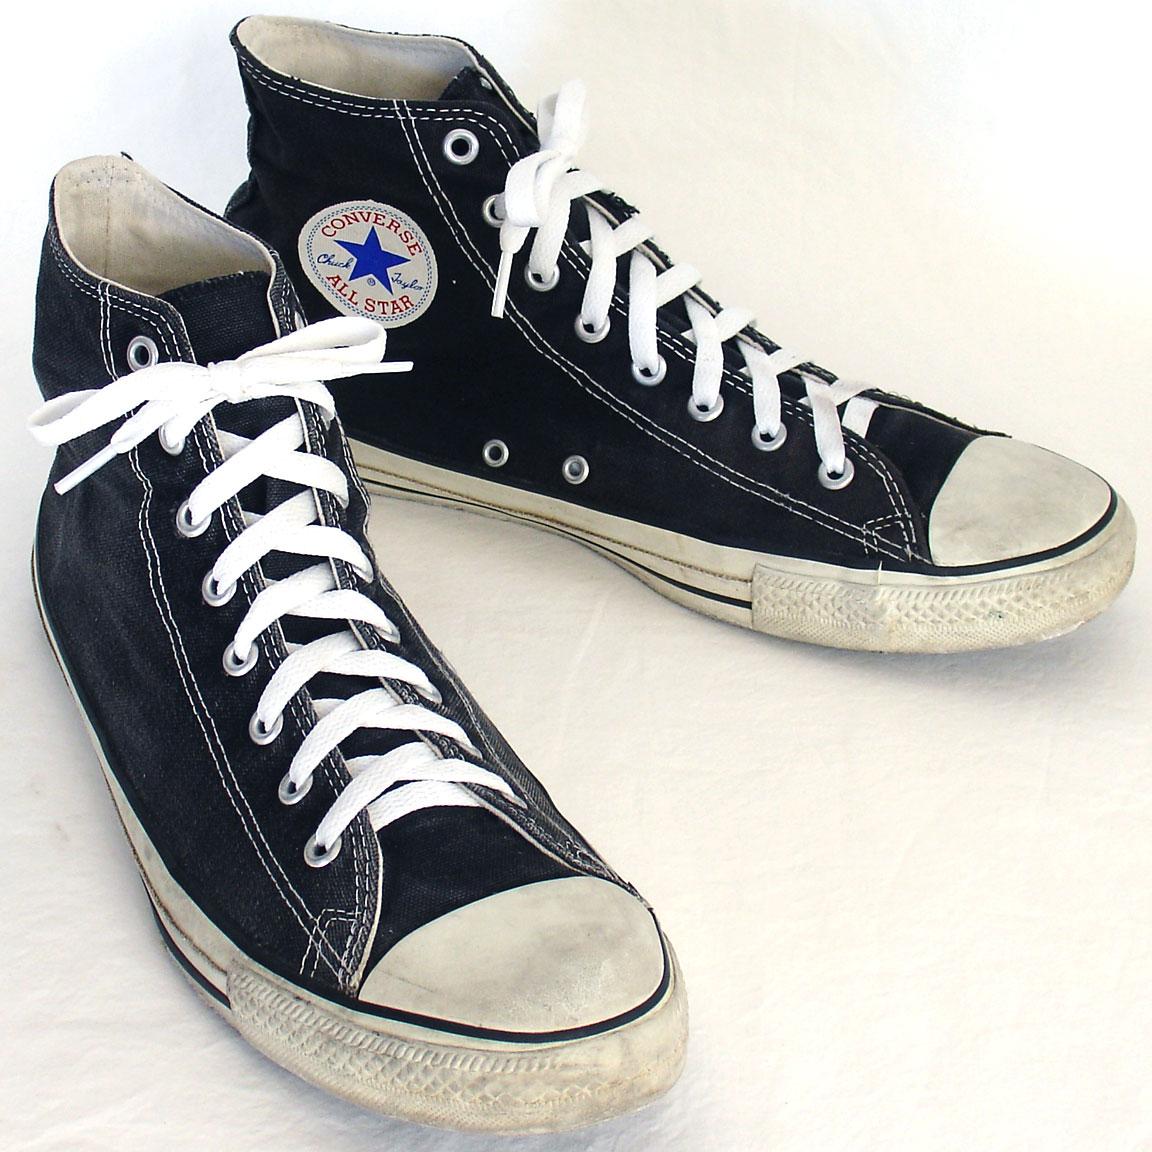 Vintage Converse High Tops 84